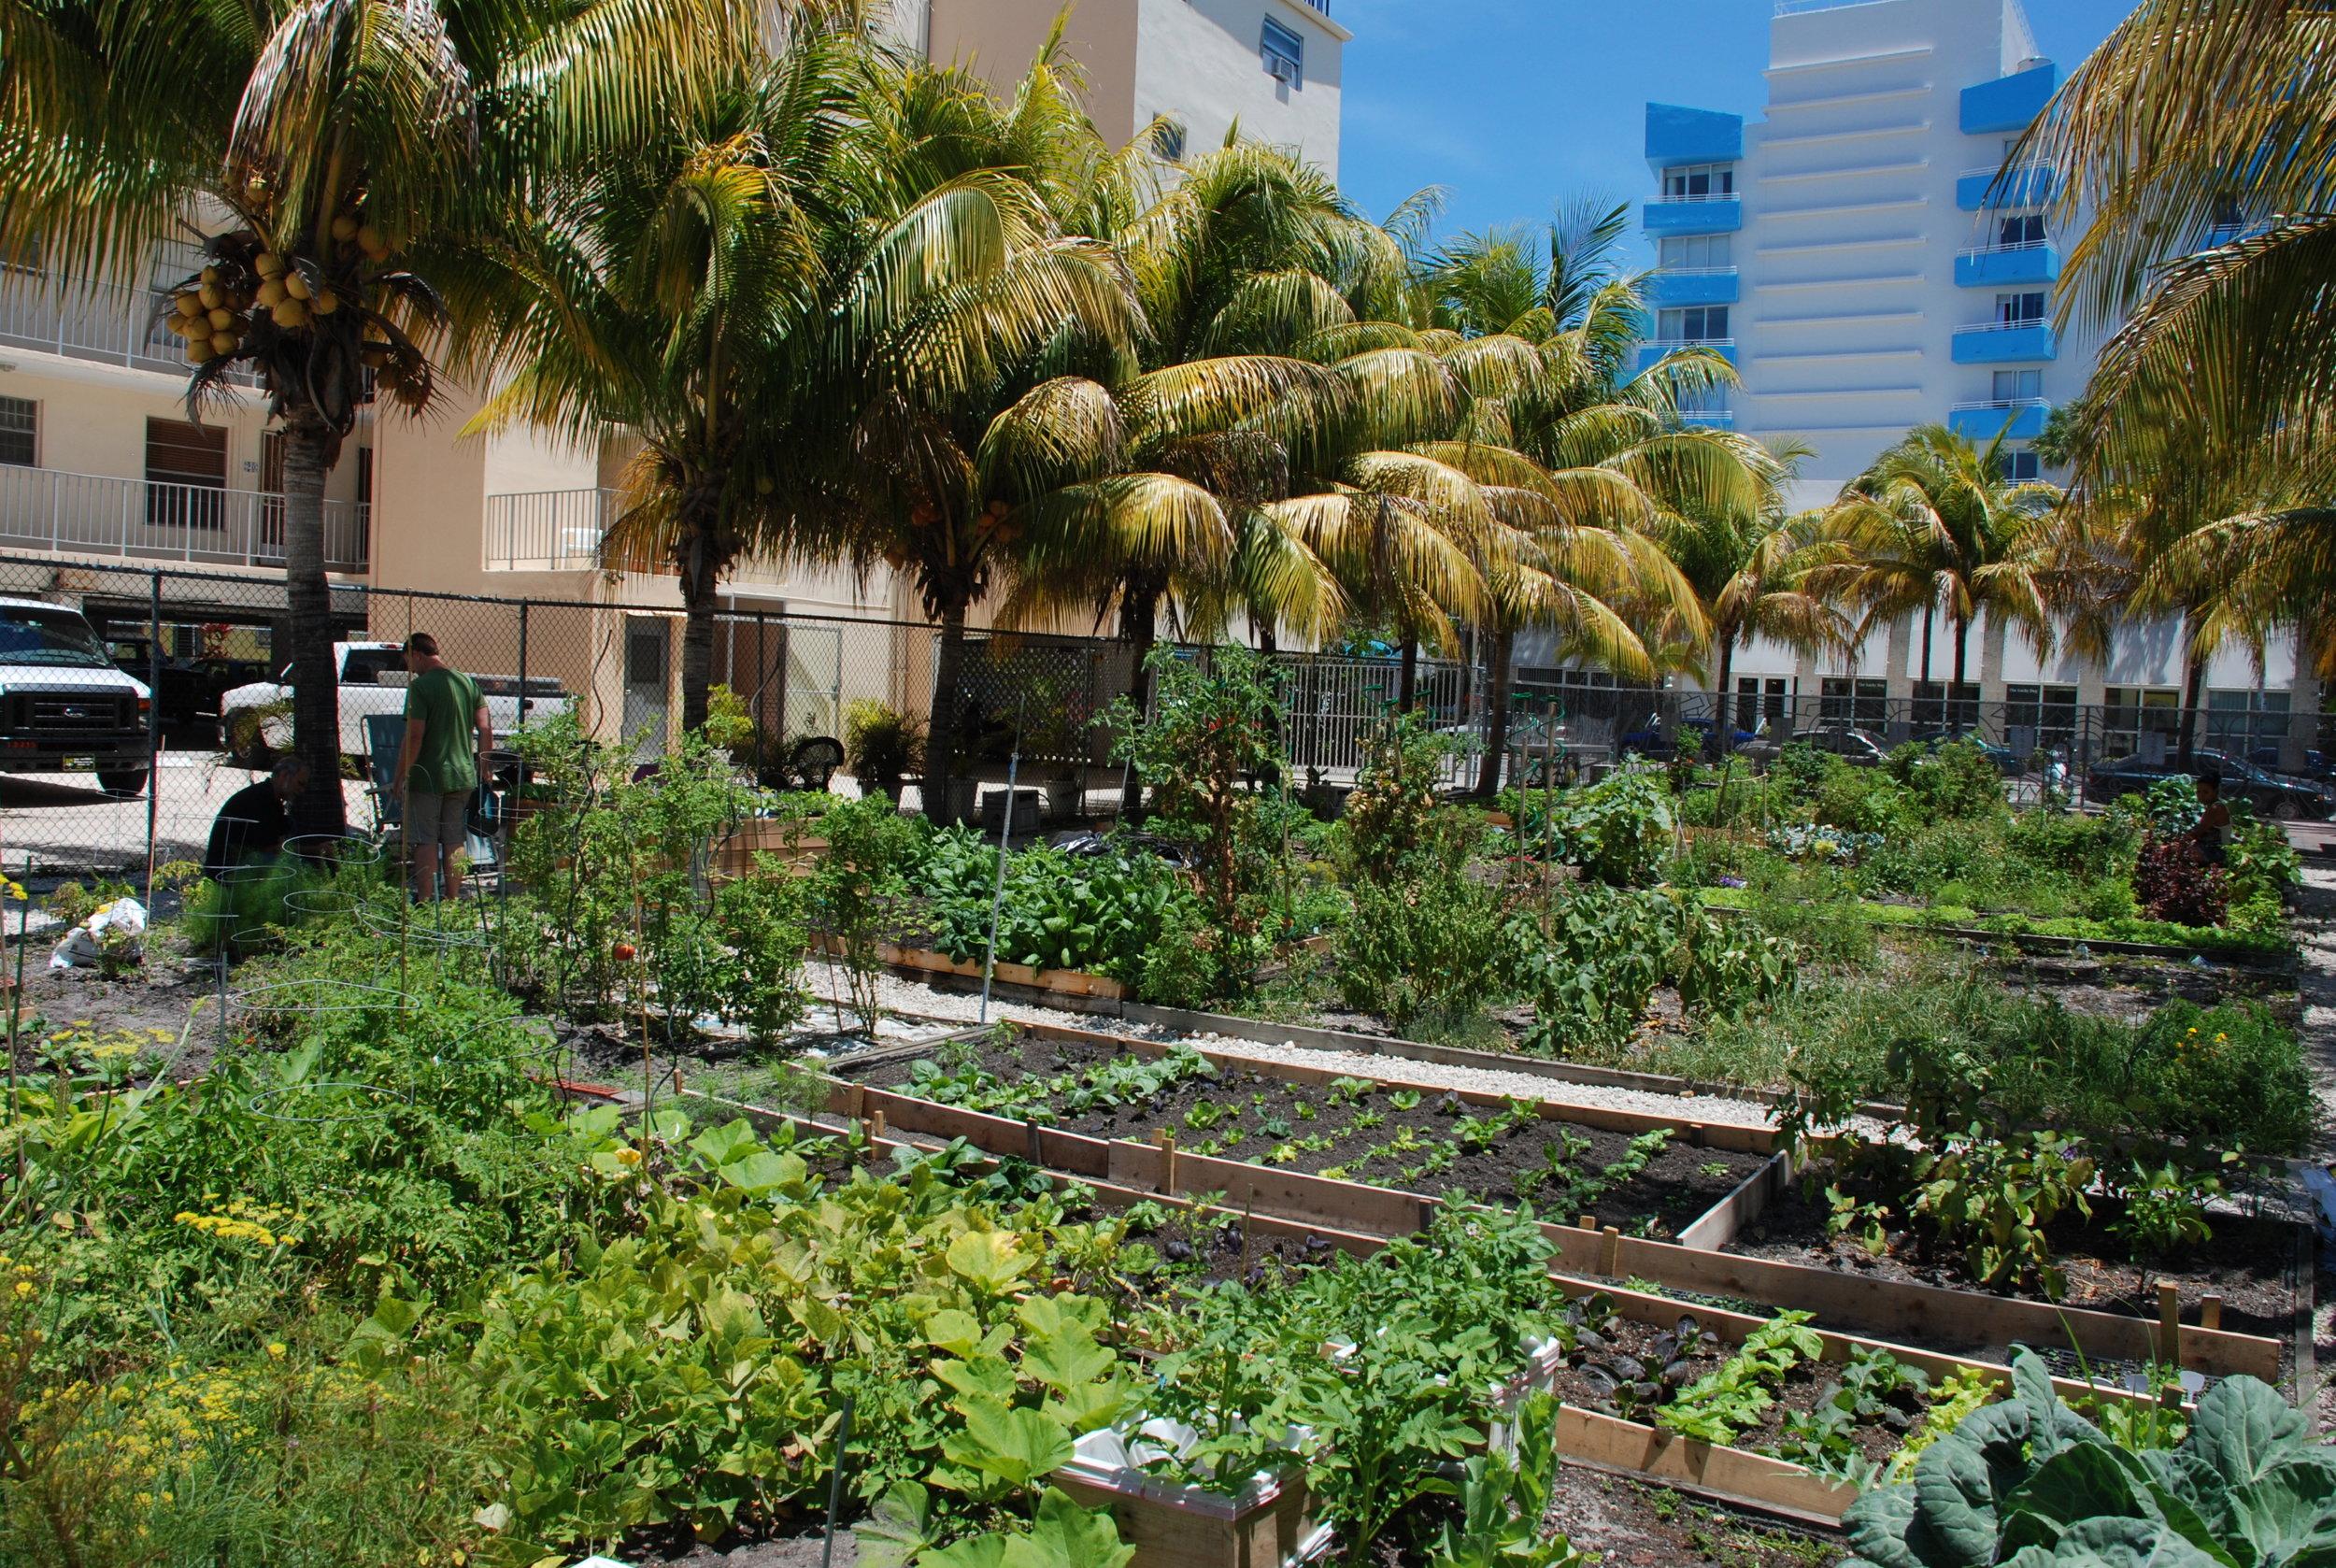 2009_SouthBeach_community_garden_Miami_3516803613.jpg